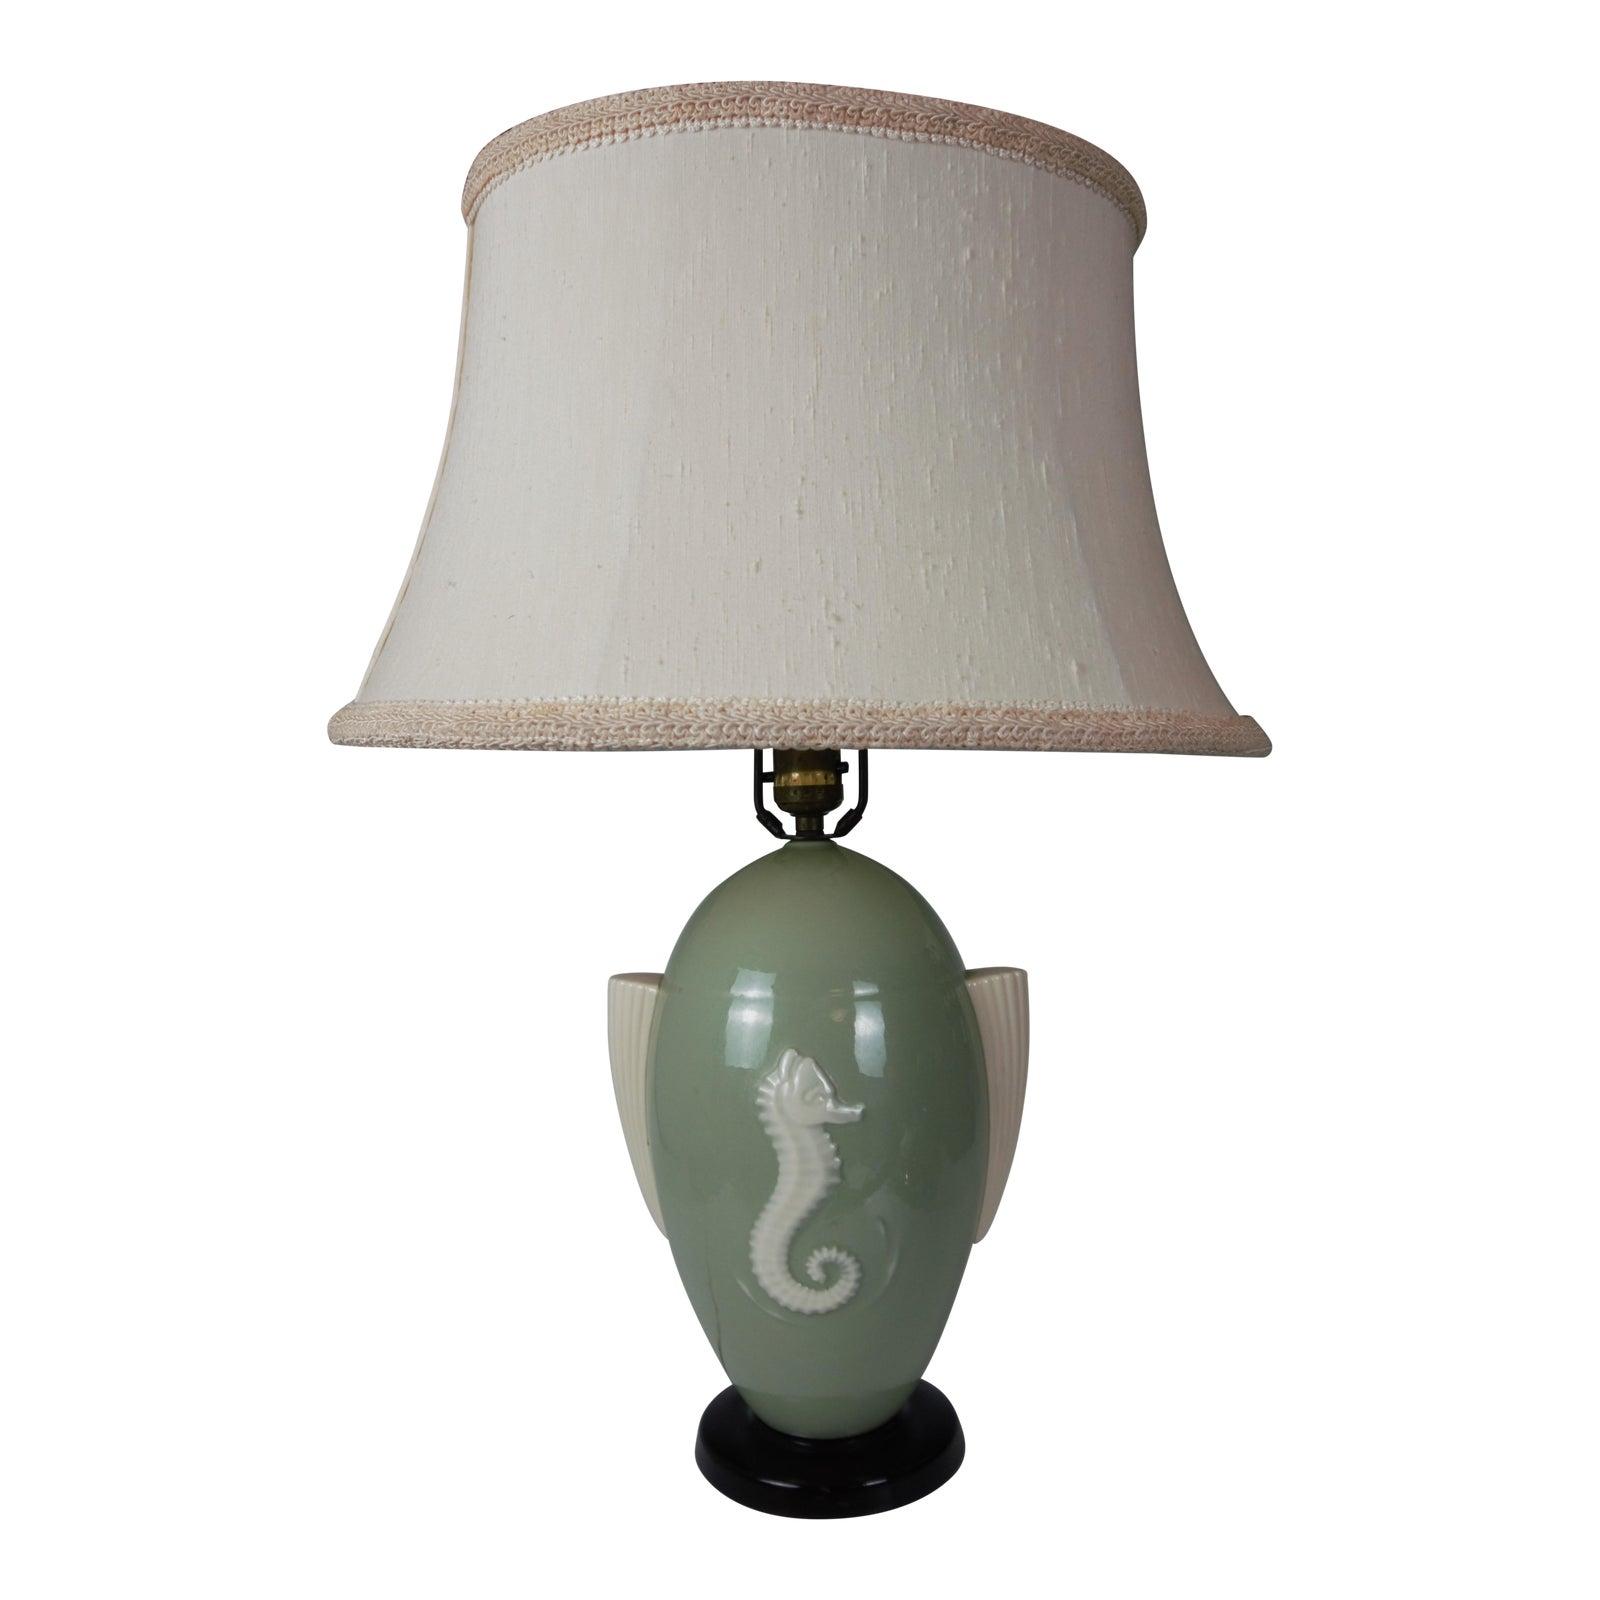 lamp product table prd seahorse wid jsp hei op sharpen